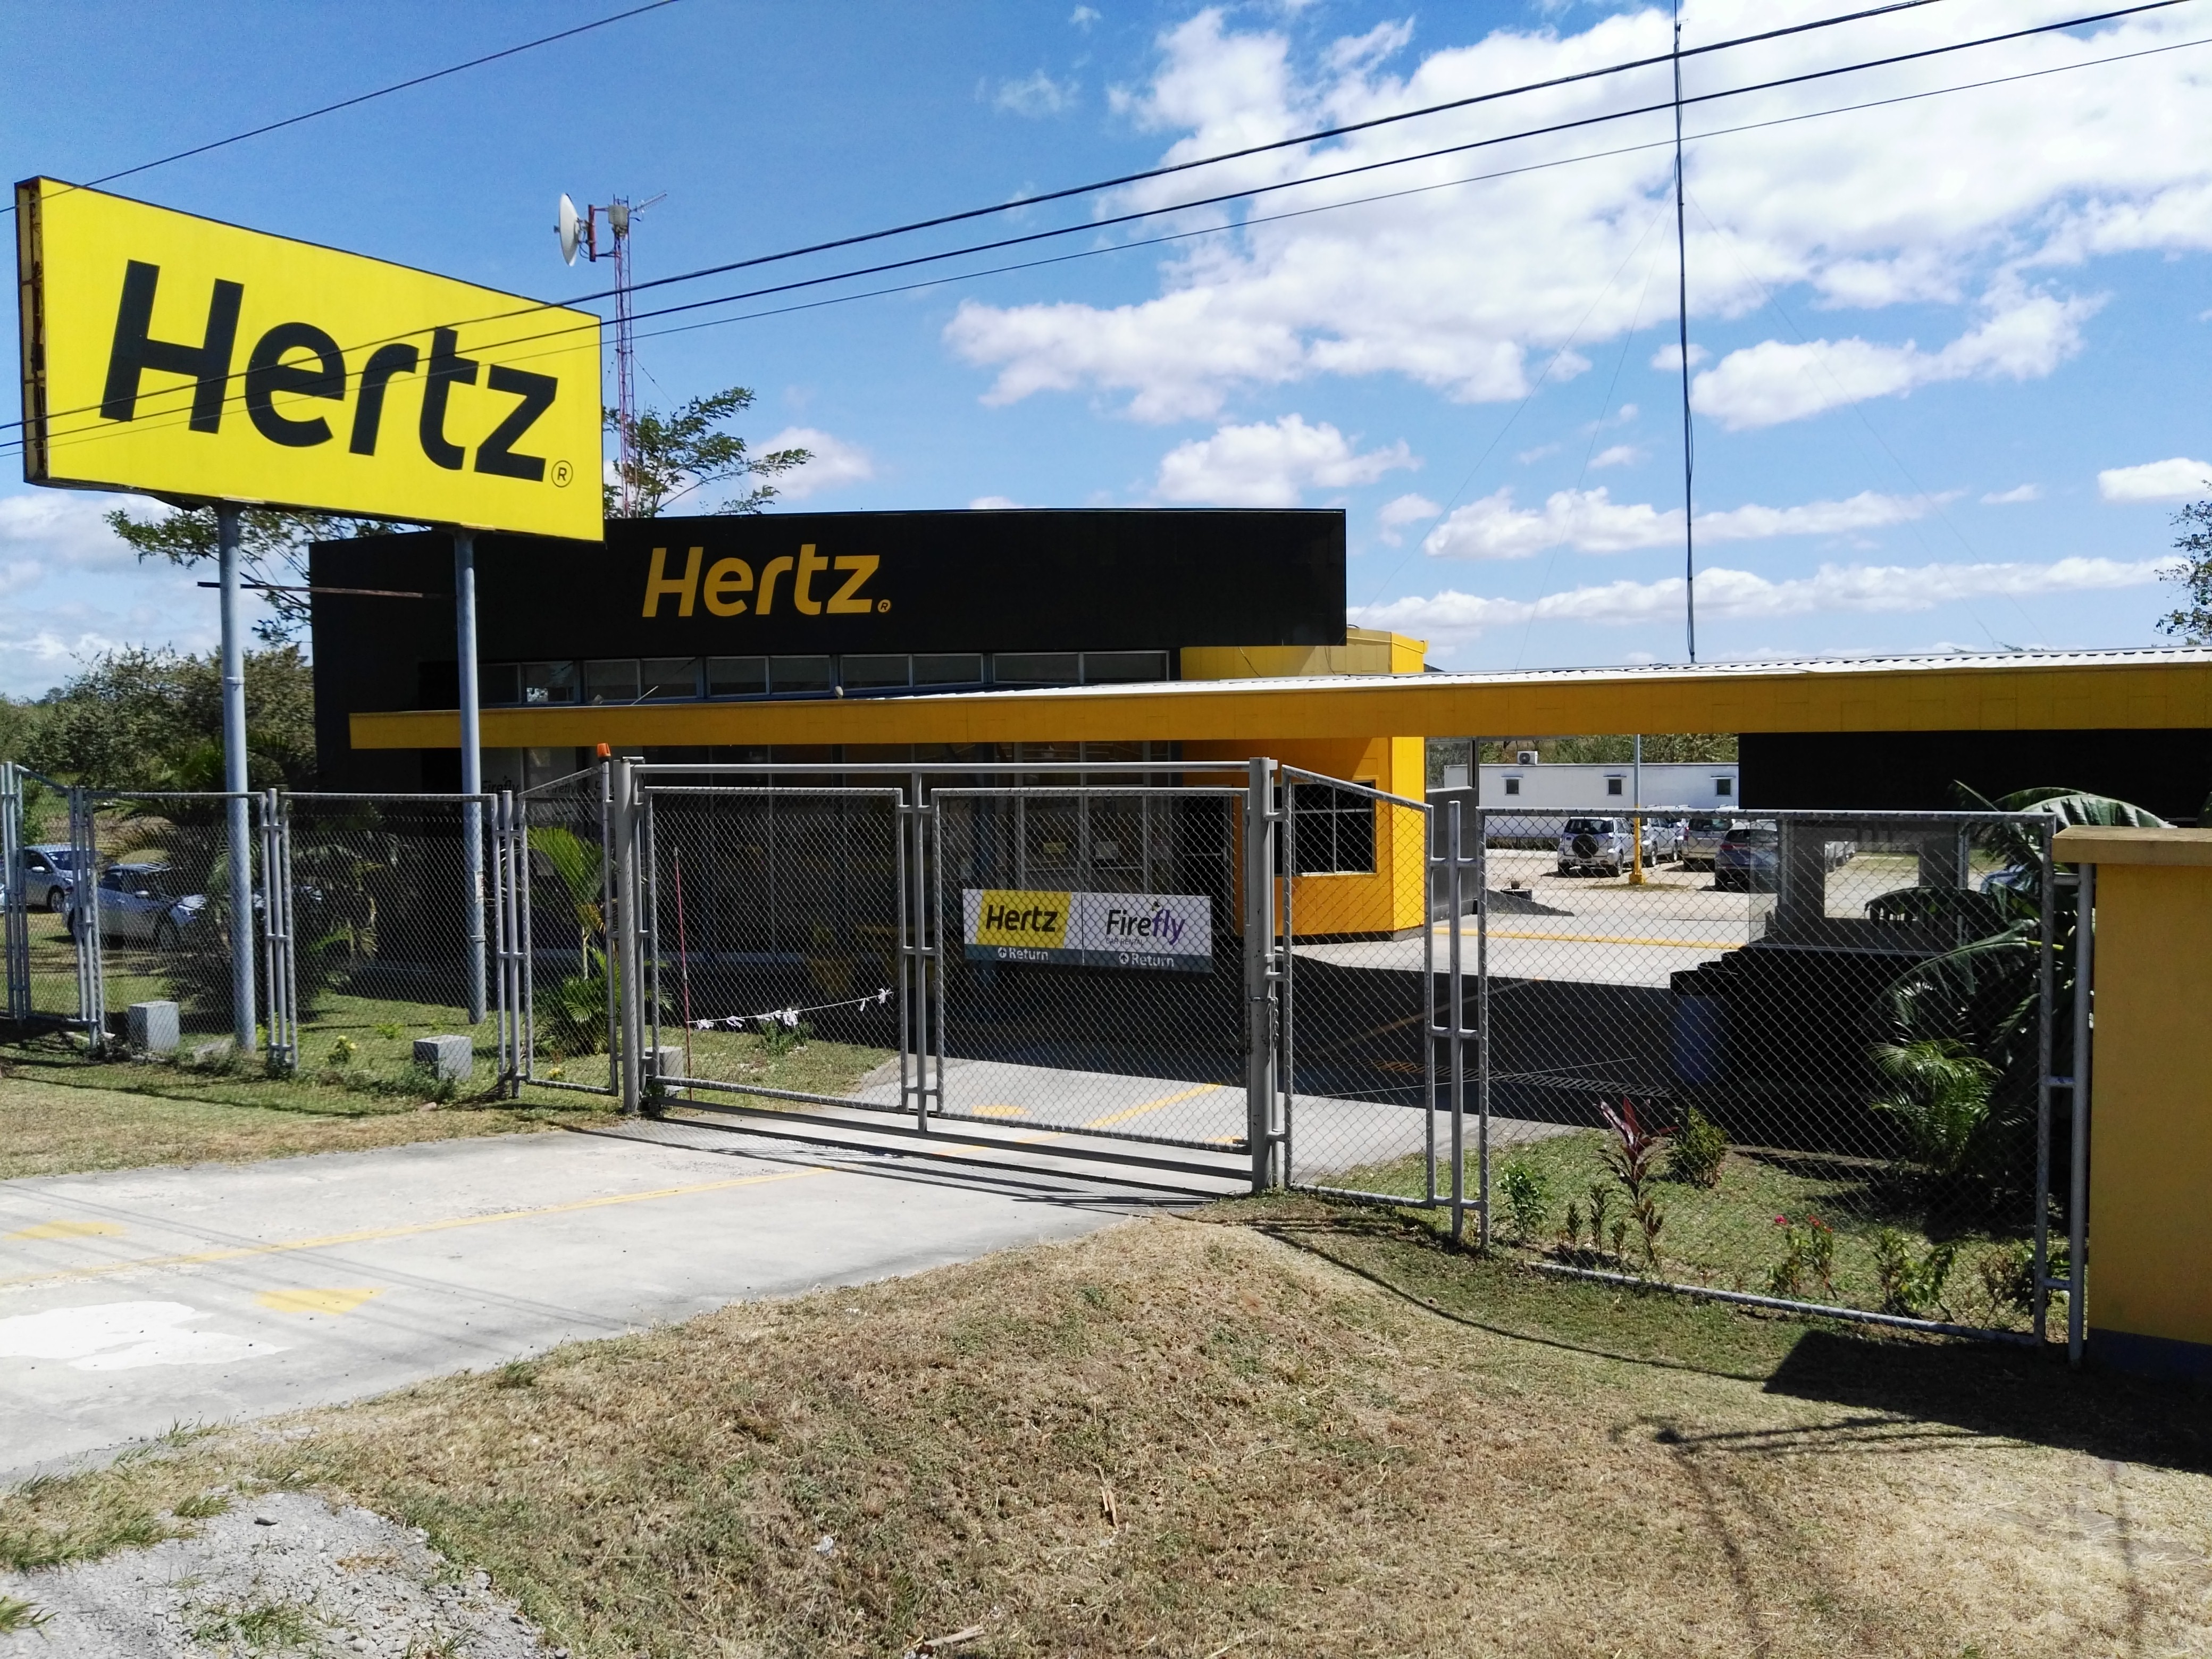 Hertz Liberia